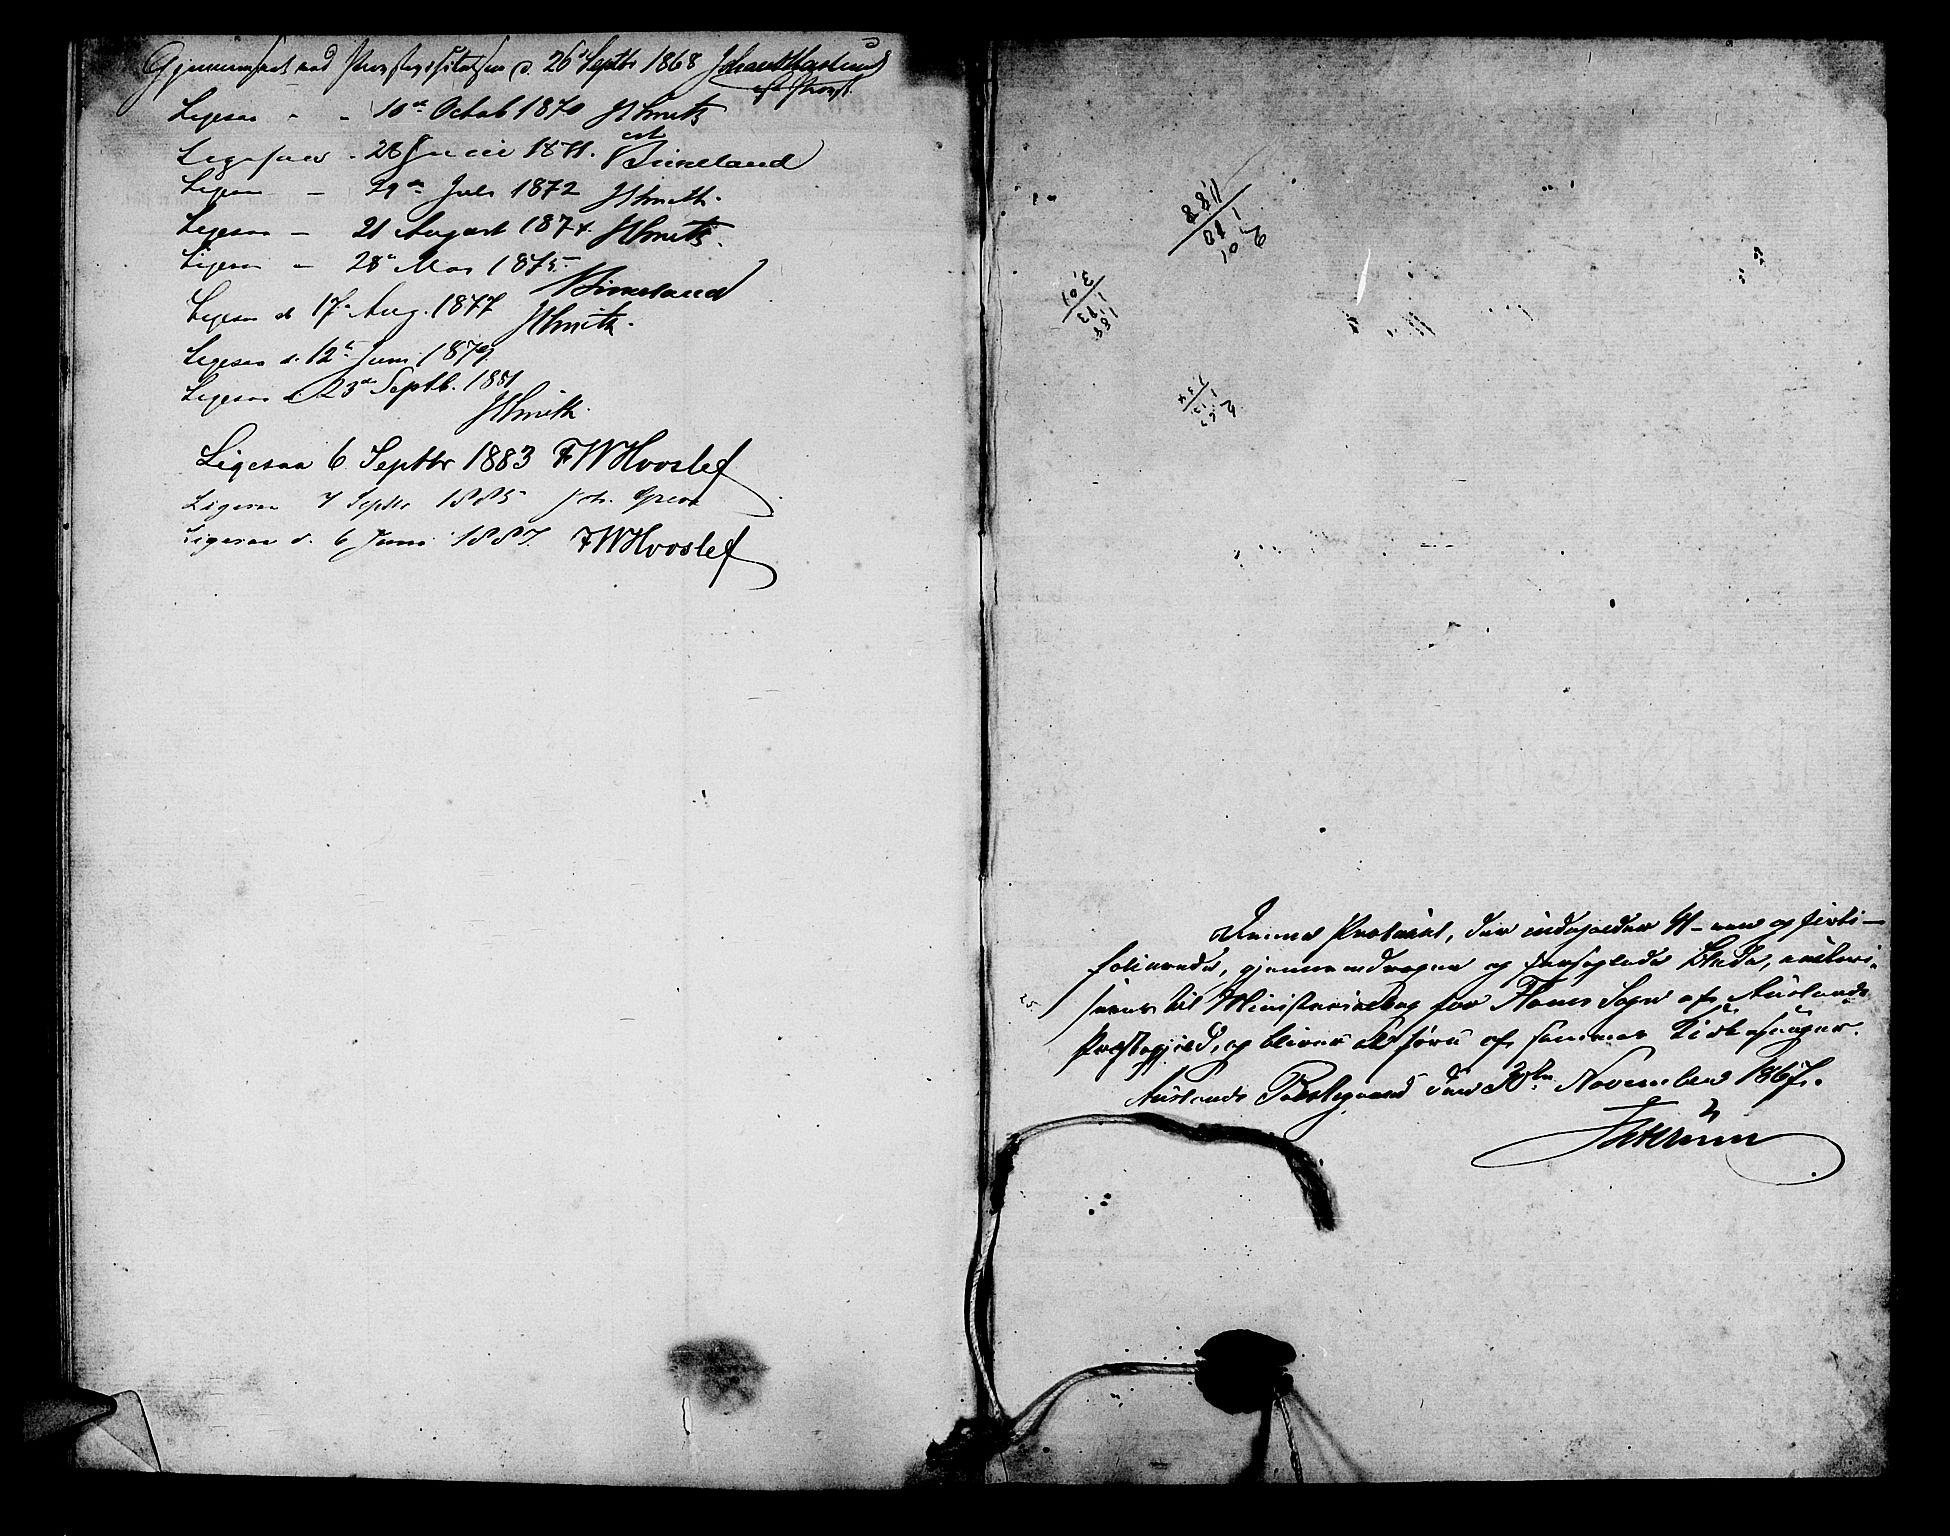 SAB, Aurland Sokneprestembete*, Klokkerbok nr. B 1, 1868-1887, s. 40